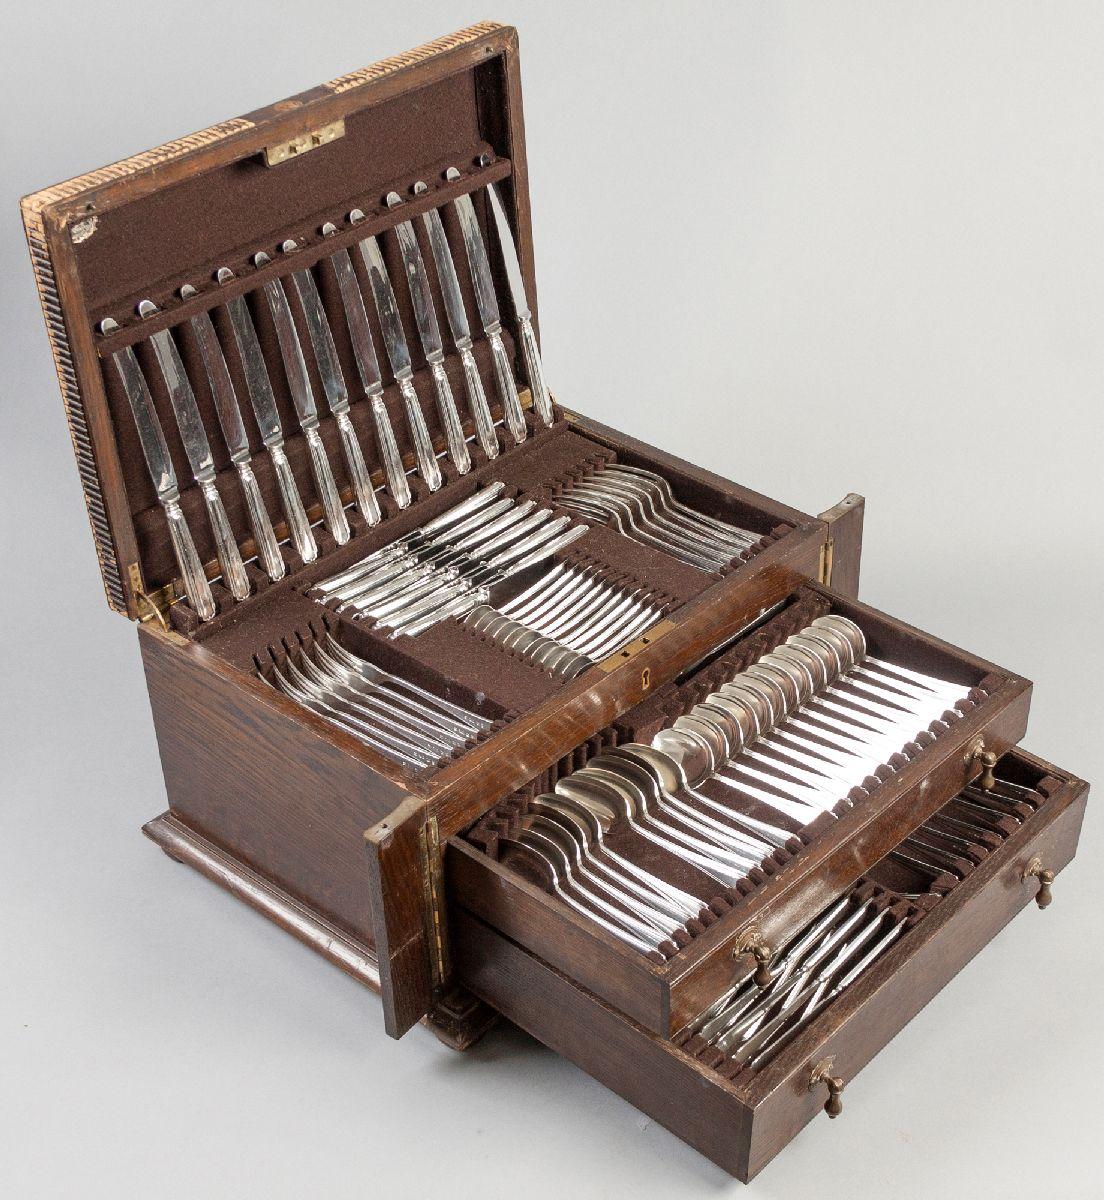 Lot 41 - A TWELVE PLACE SILVERPLATE CUTLERY SET, comprising: of 12 dinner knves, 12 dinner forks, 12 salad